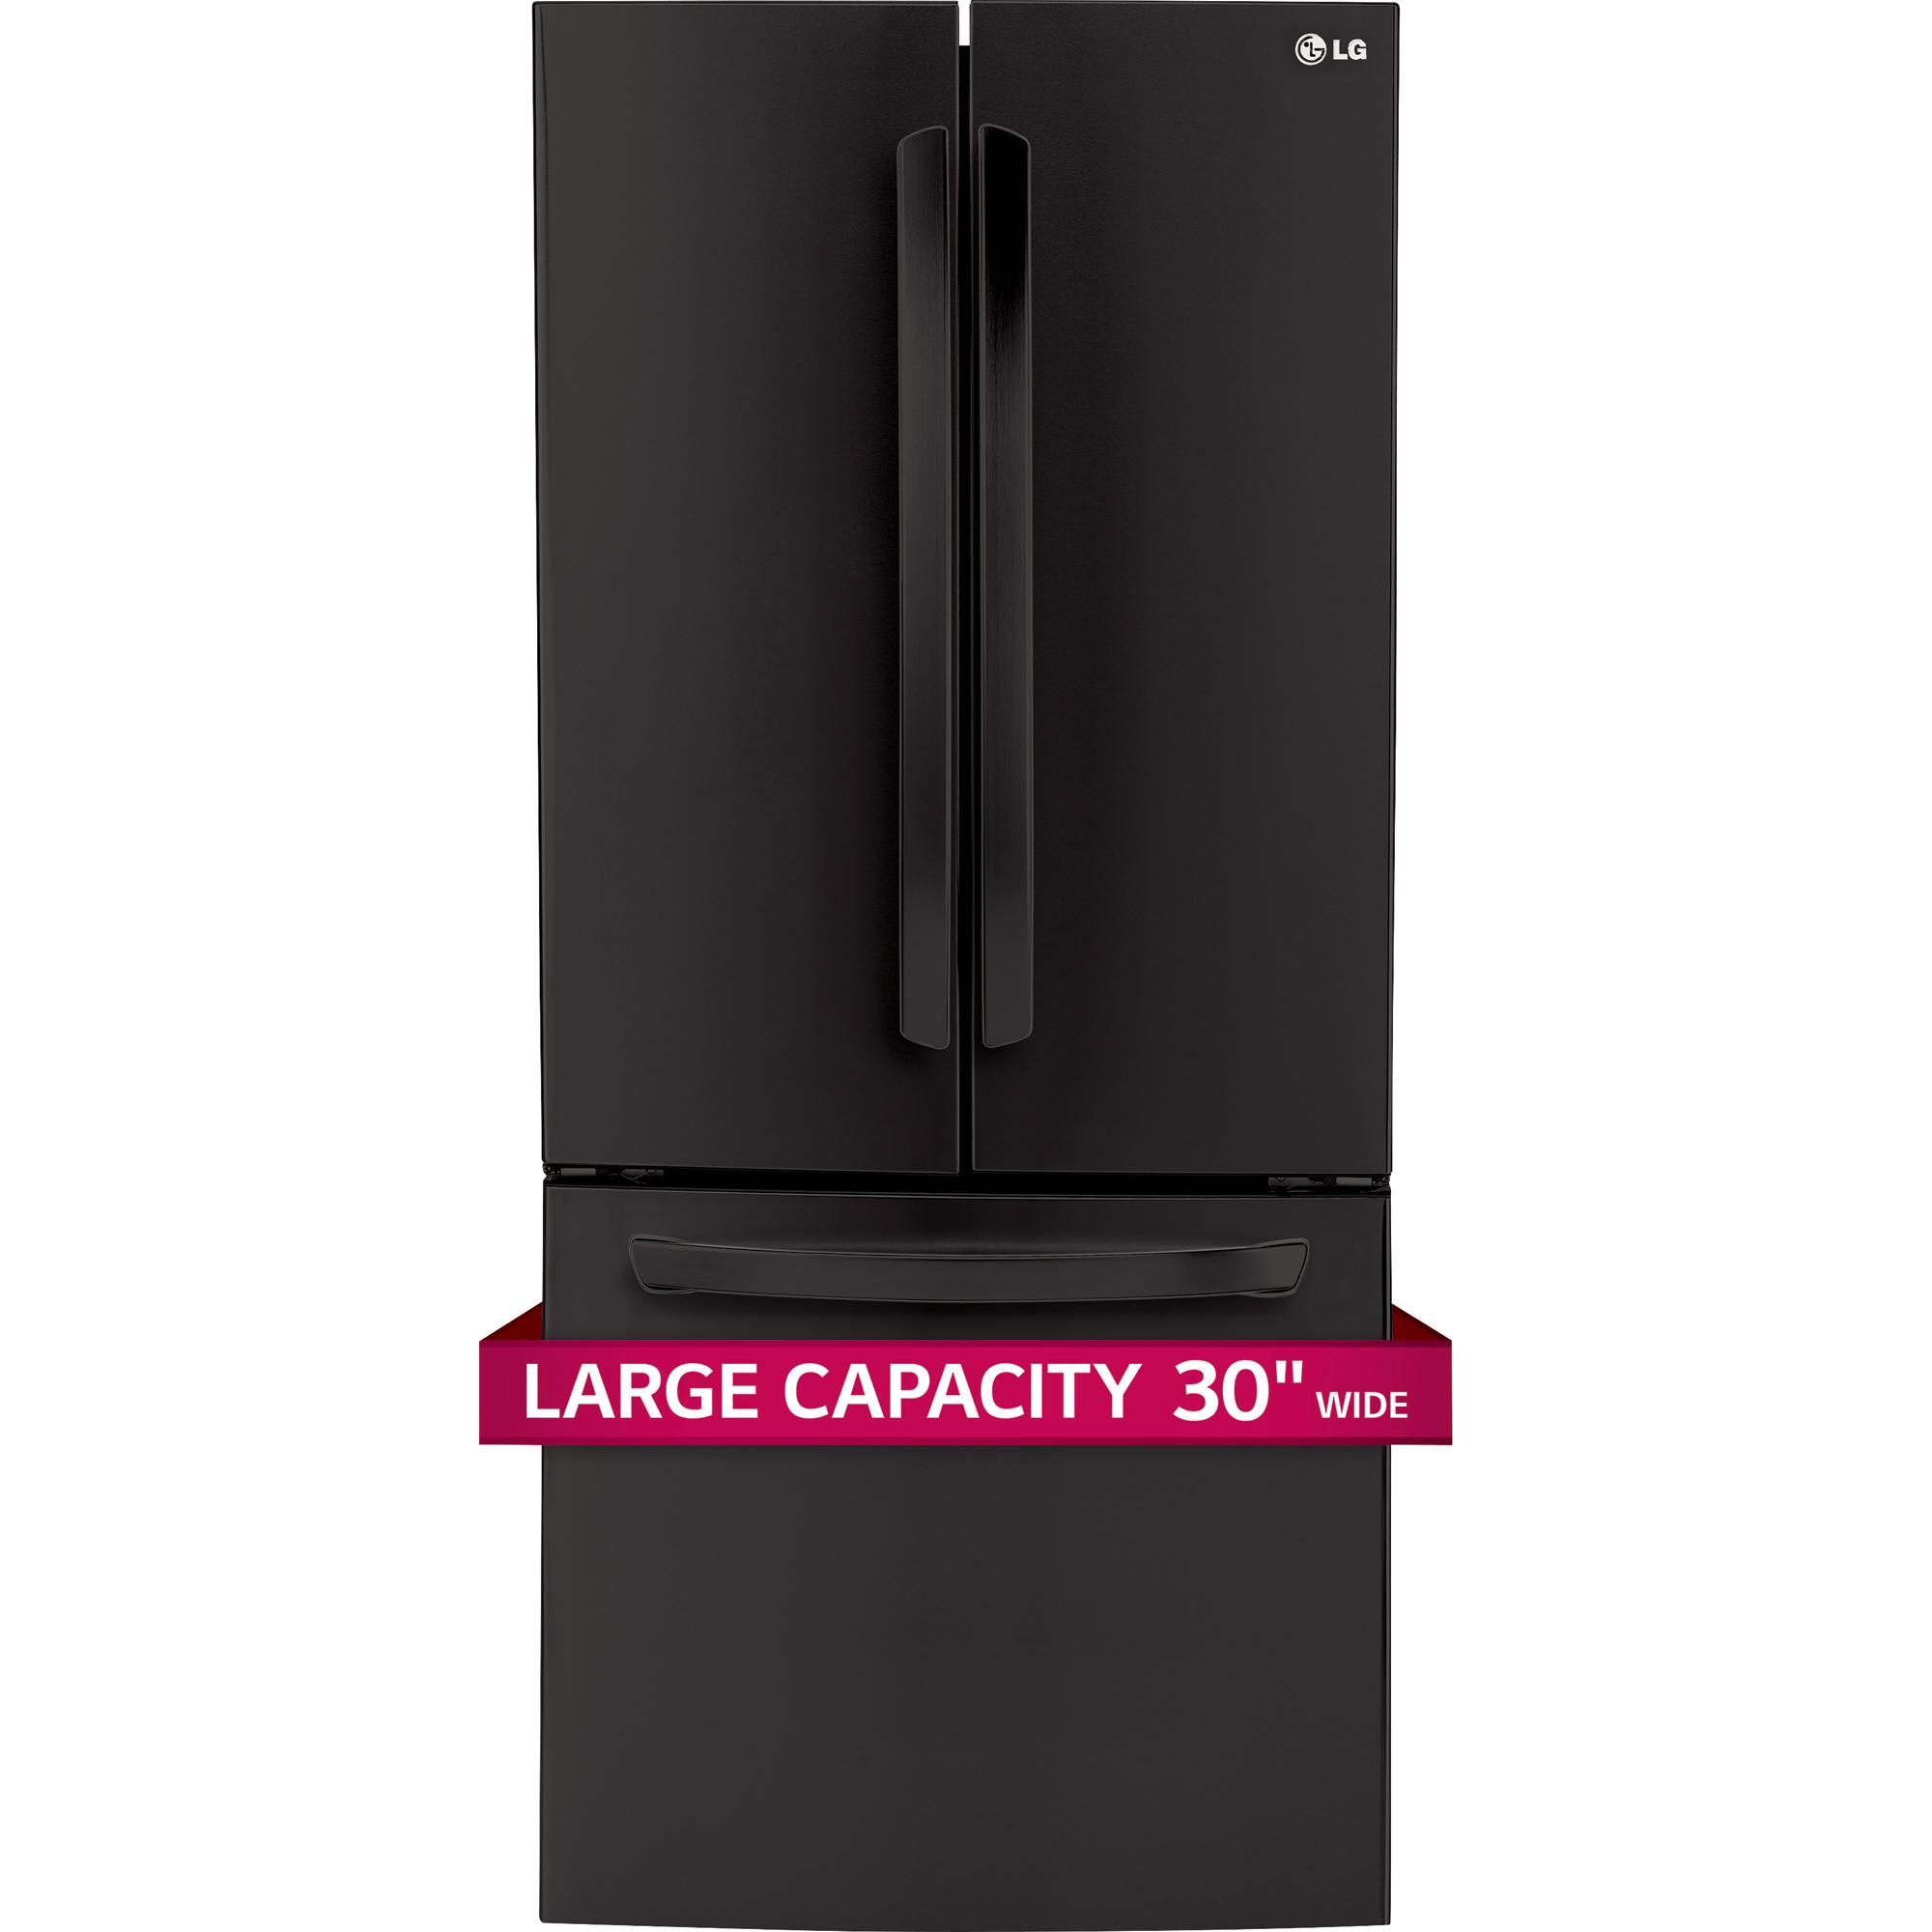 LG LFC22770SB 21.8 cu. ft. French Door Bottom-Freezer Refrigerator